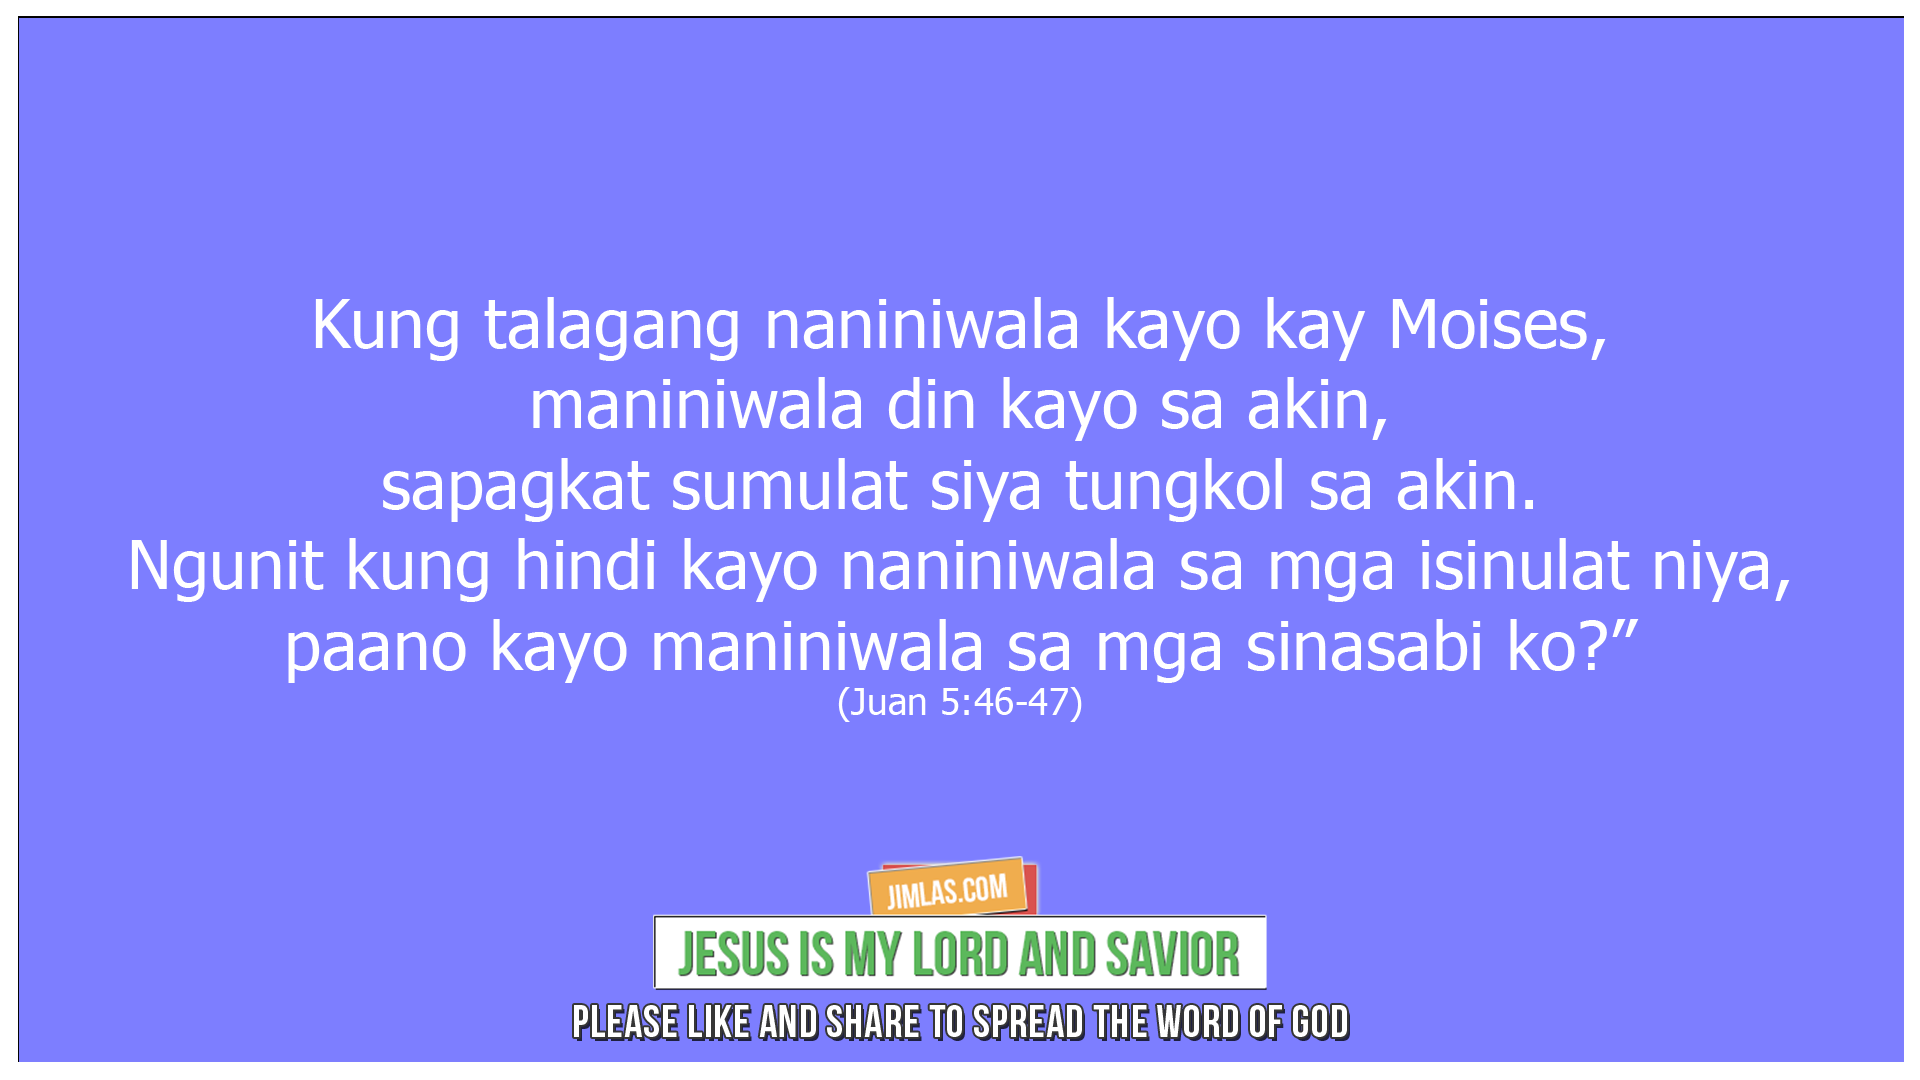 Juan 5 46-47, Juan 5:46-47